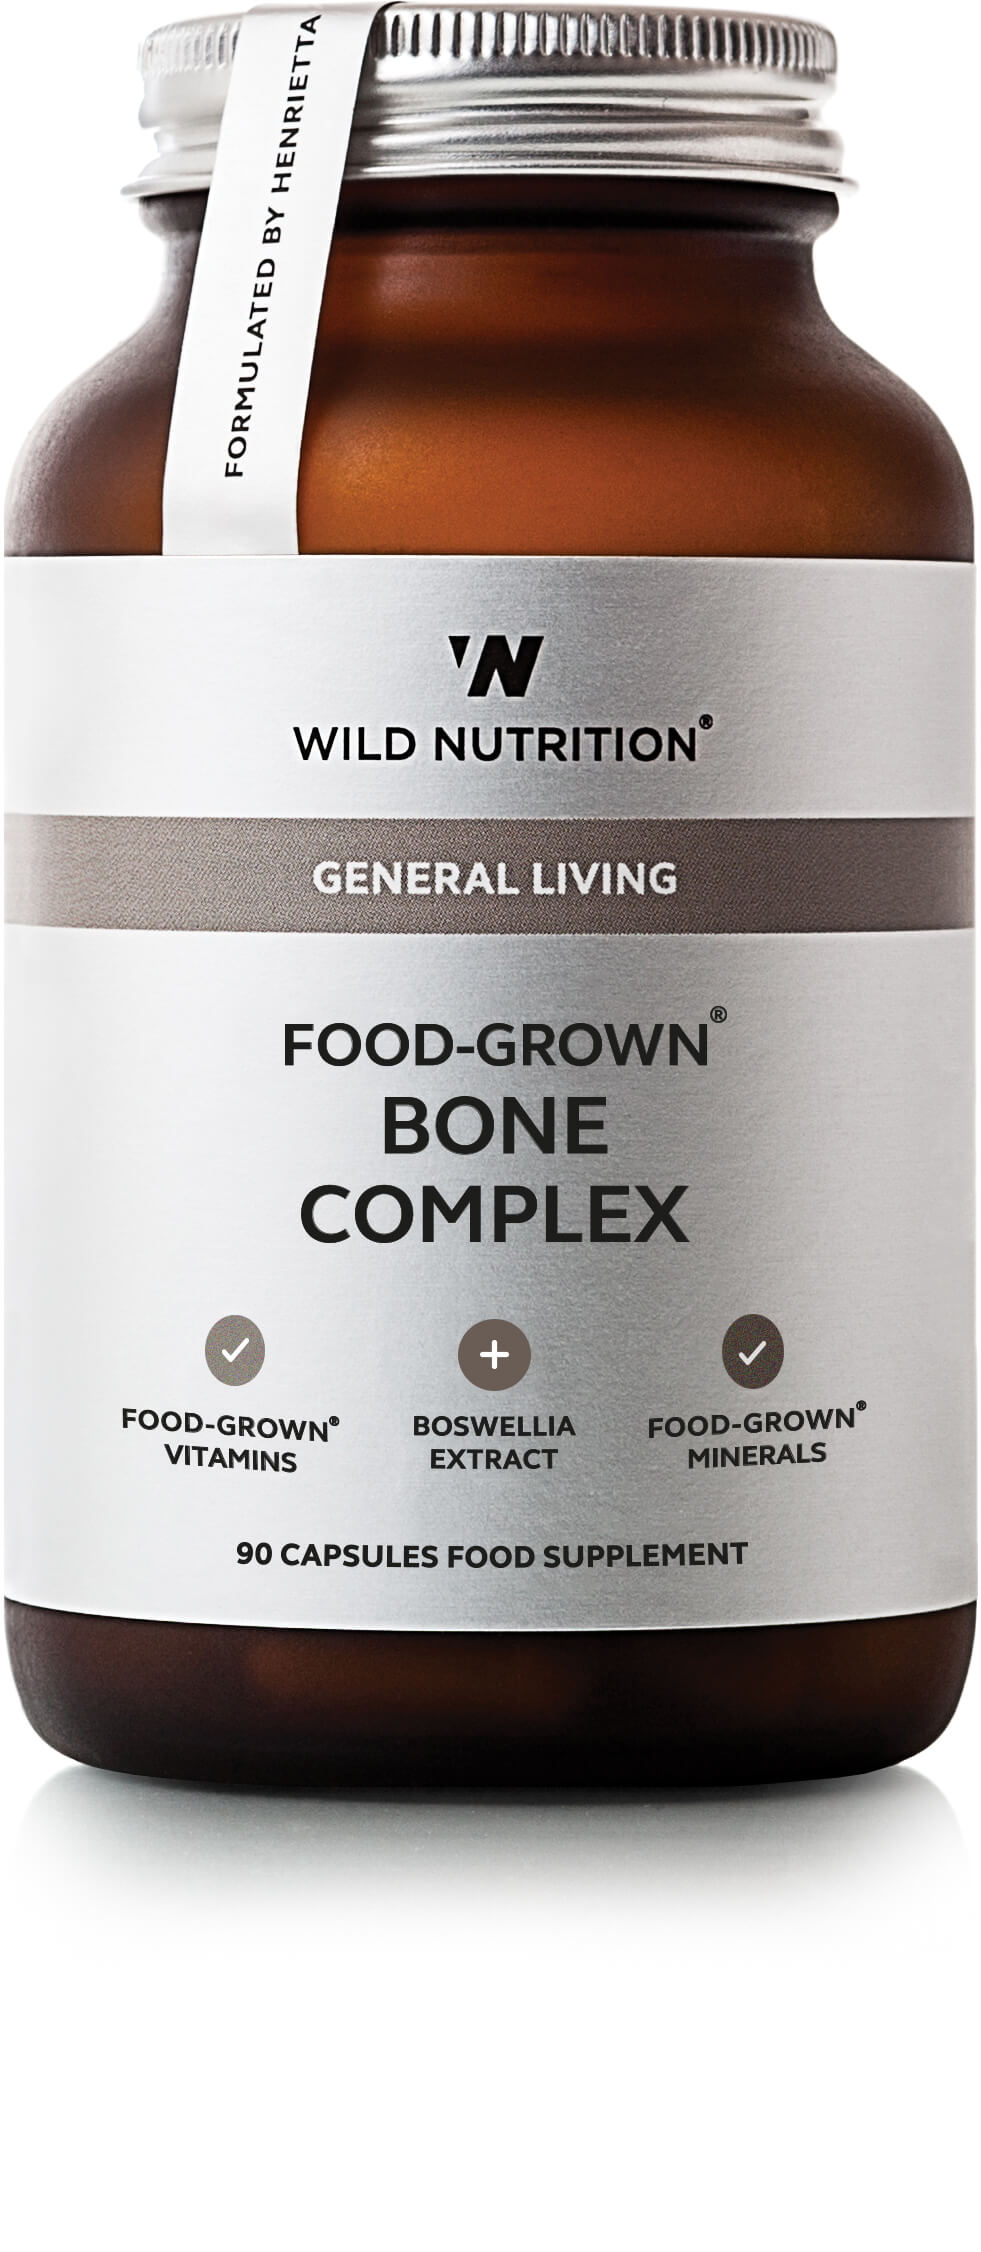 General Living Food-Grown Bone Complex 90's